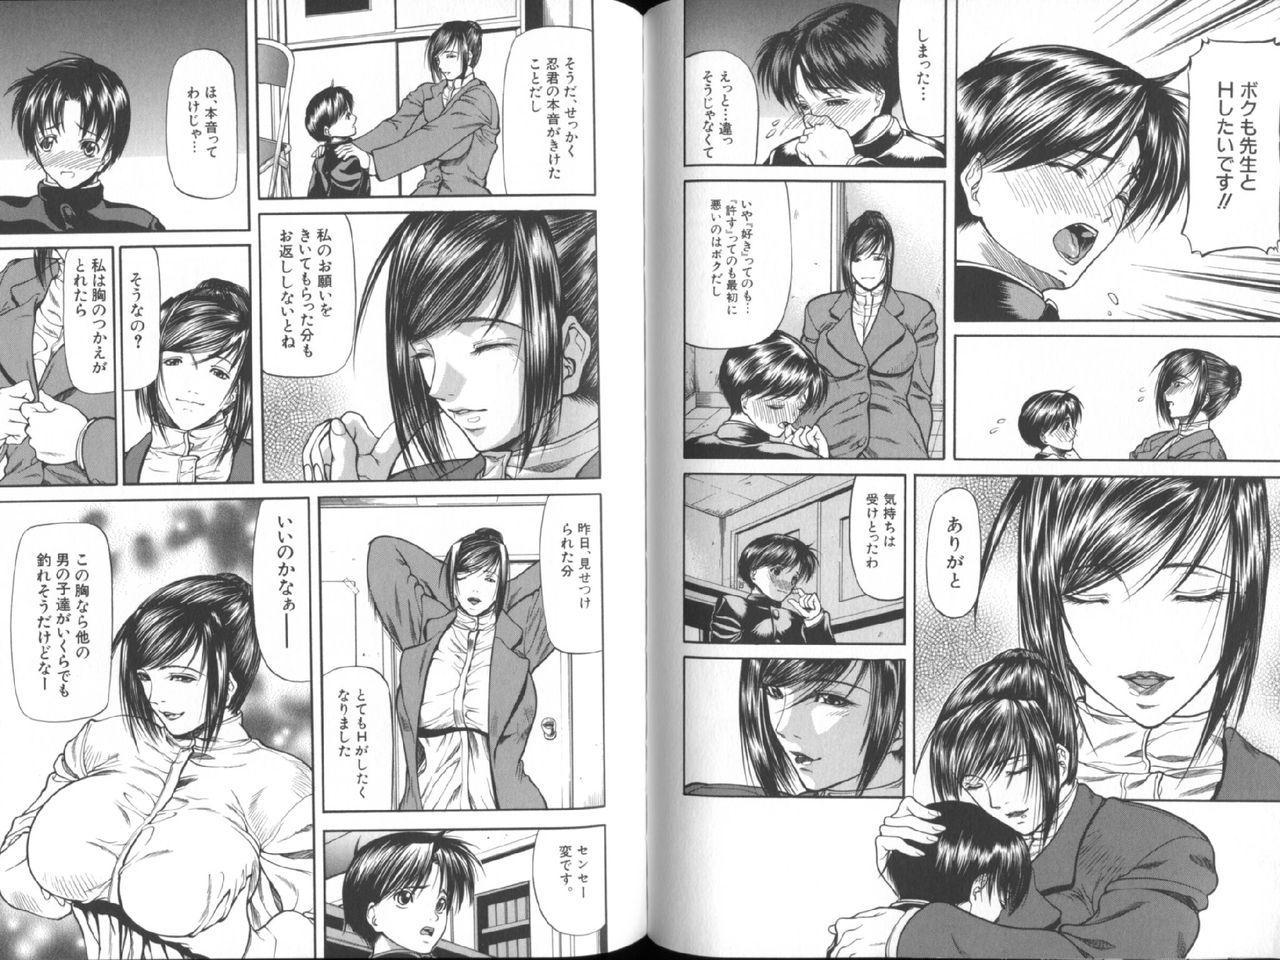 Senjou - A Desire is Instigated 37